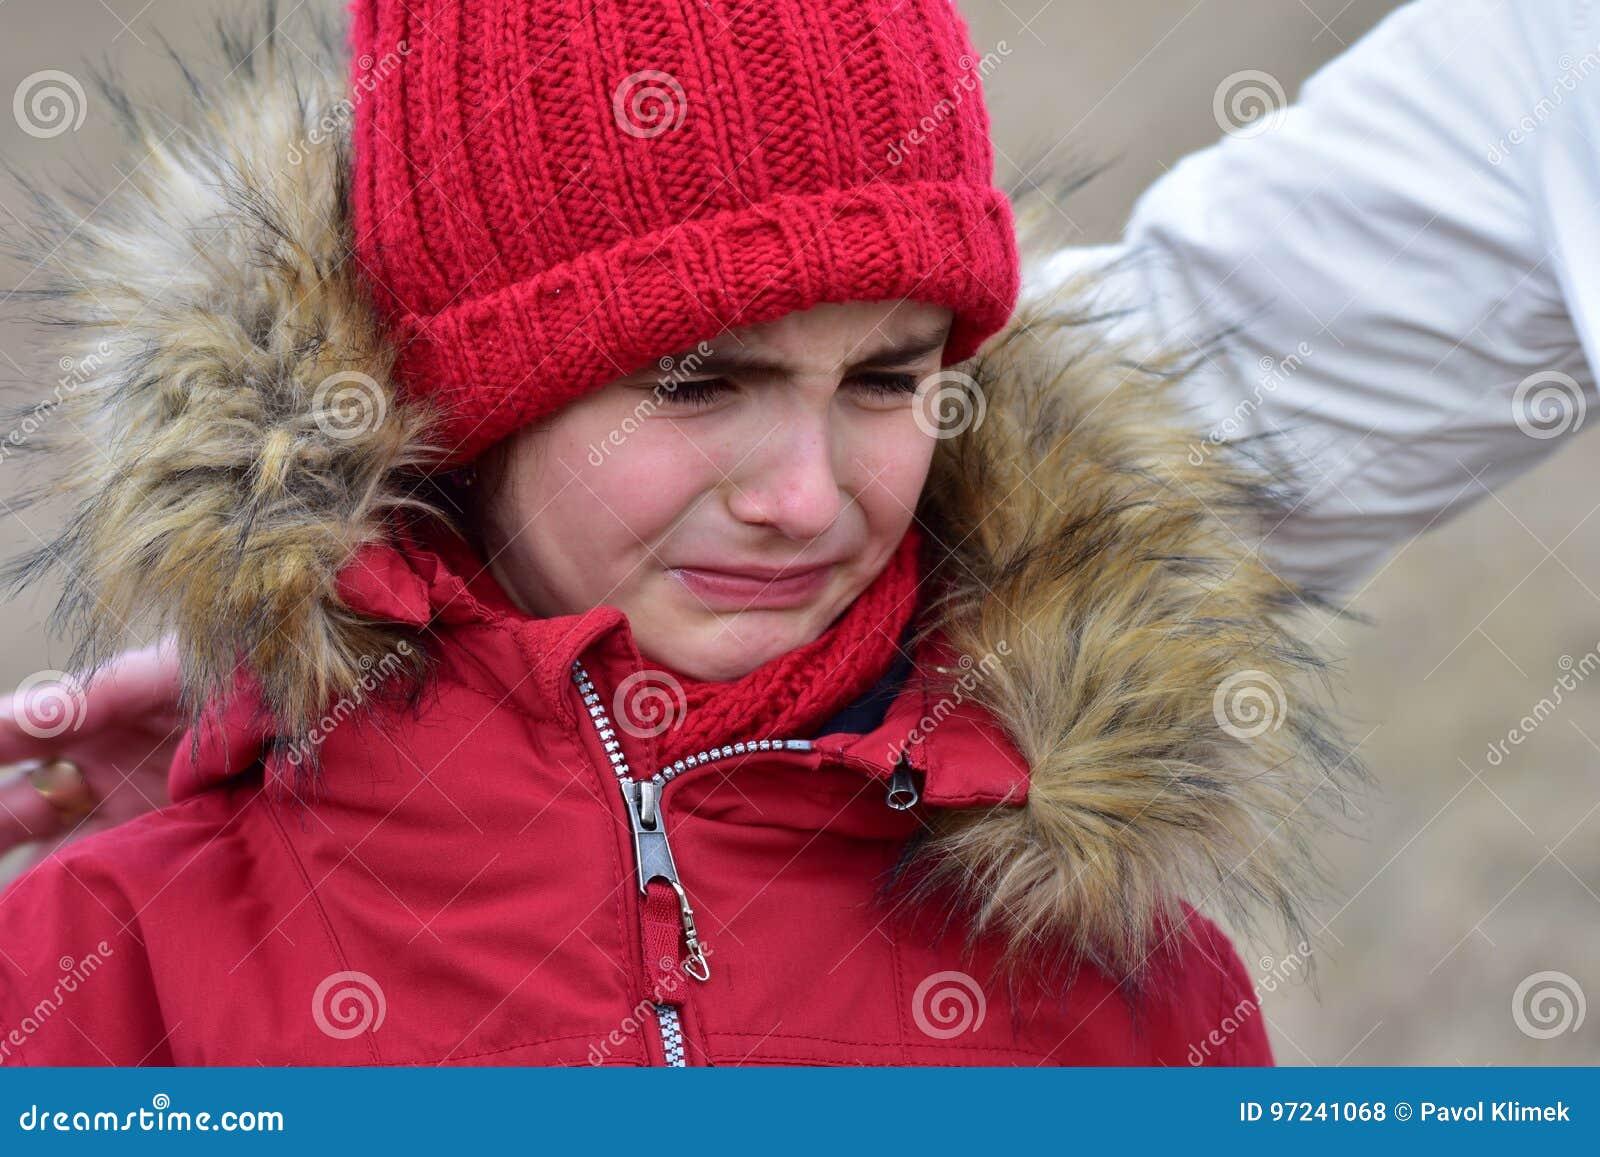 Girlk младенца портрета плача несчастное